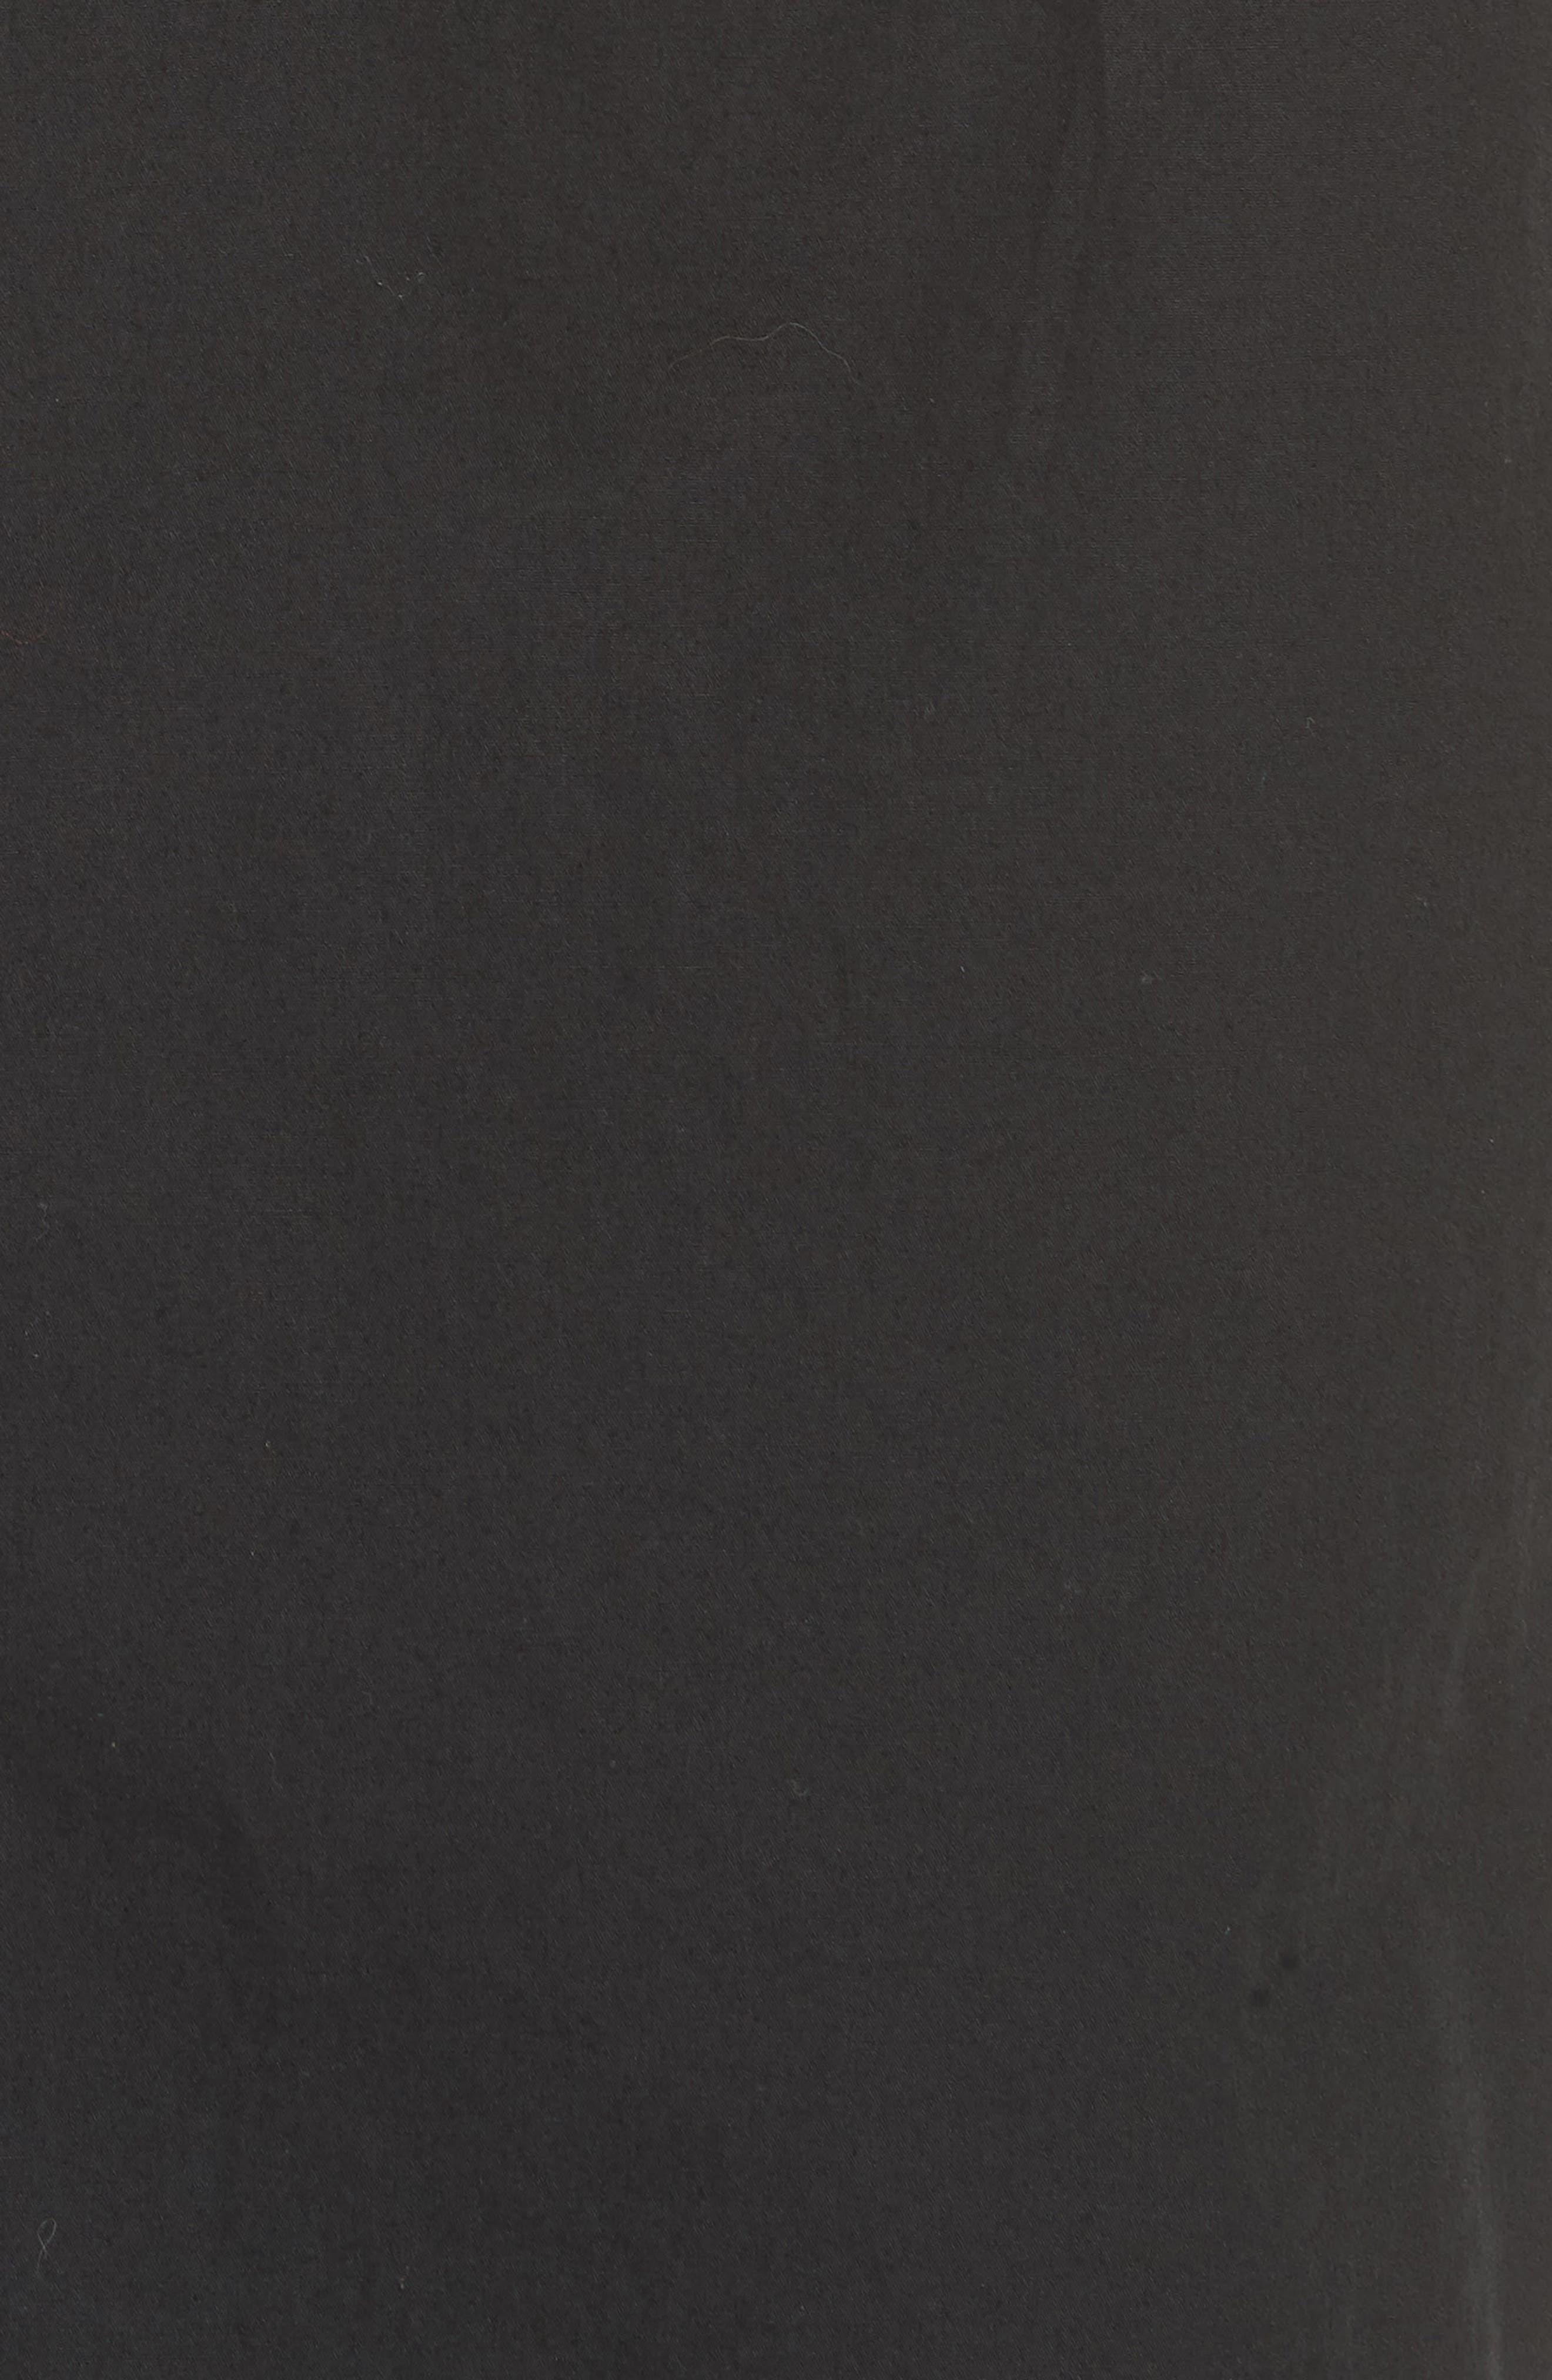 High Waist Wrap Skirt,                             Alternate thumbnail 5, color,                             Black